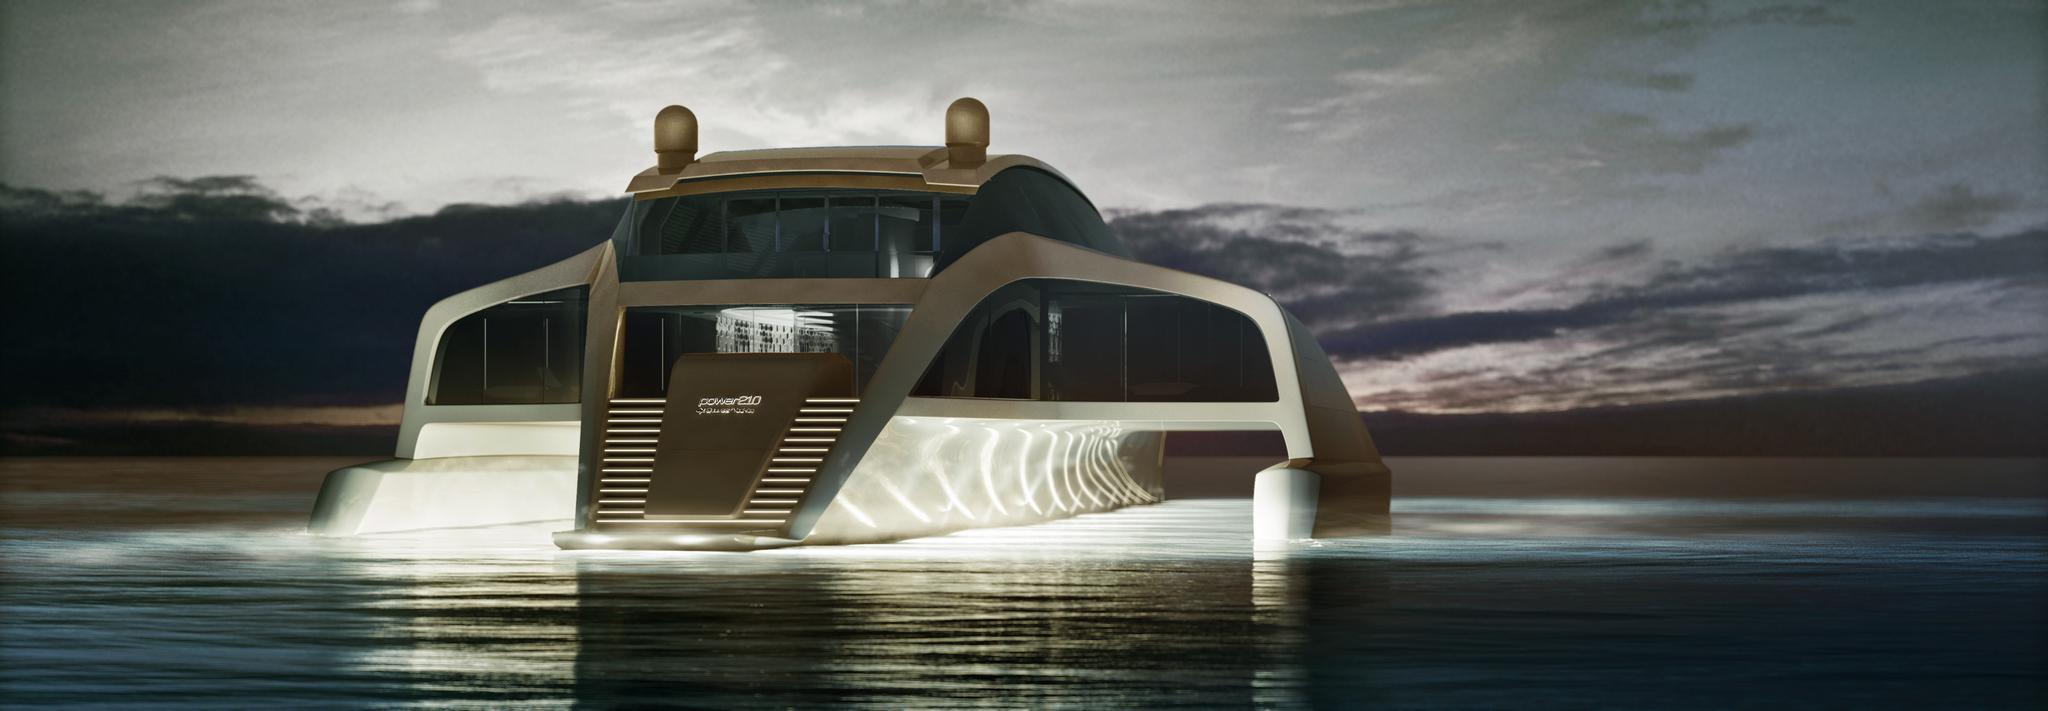 210 Sunreef Power Trimaran - Sunreef Yachts